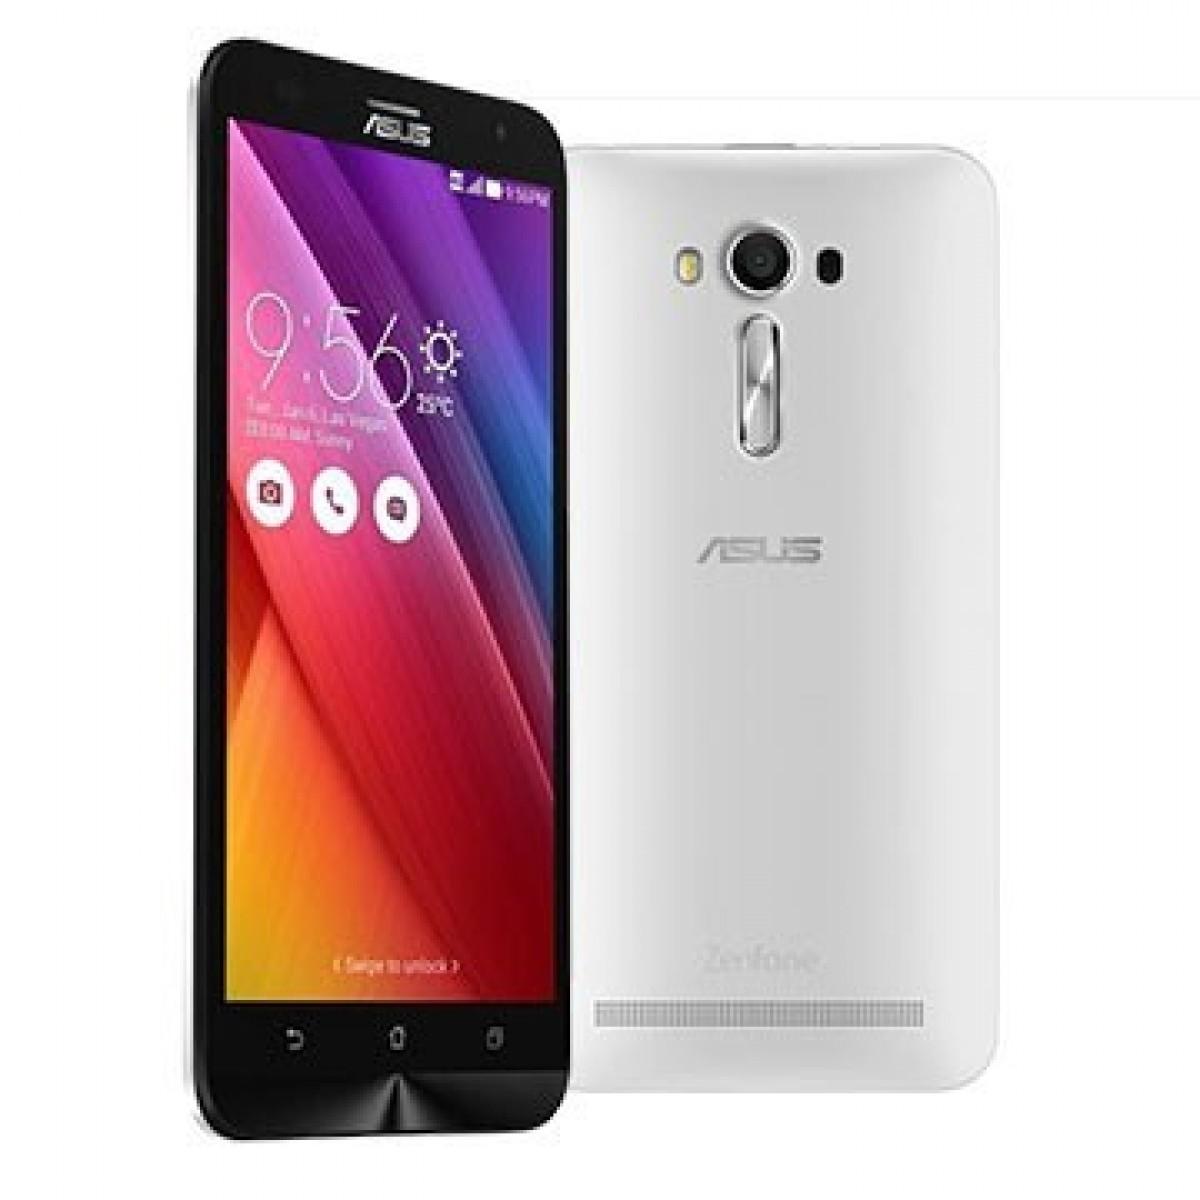 ASUS Zenfone 2 Laser (ZE500KL) 5นิ้ว 4G LTE 2ซิม กล้อง 13 MP ประกันศูนย์ แถมซิม 4G